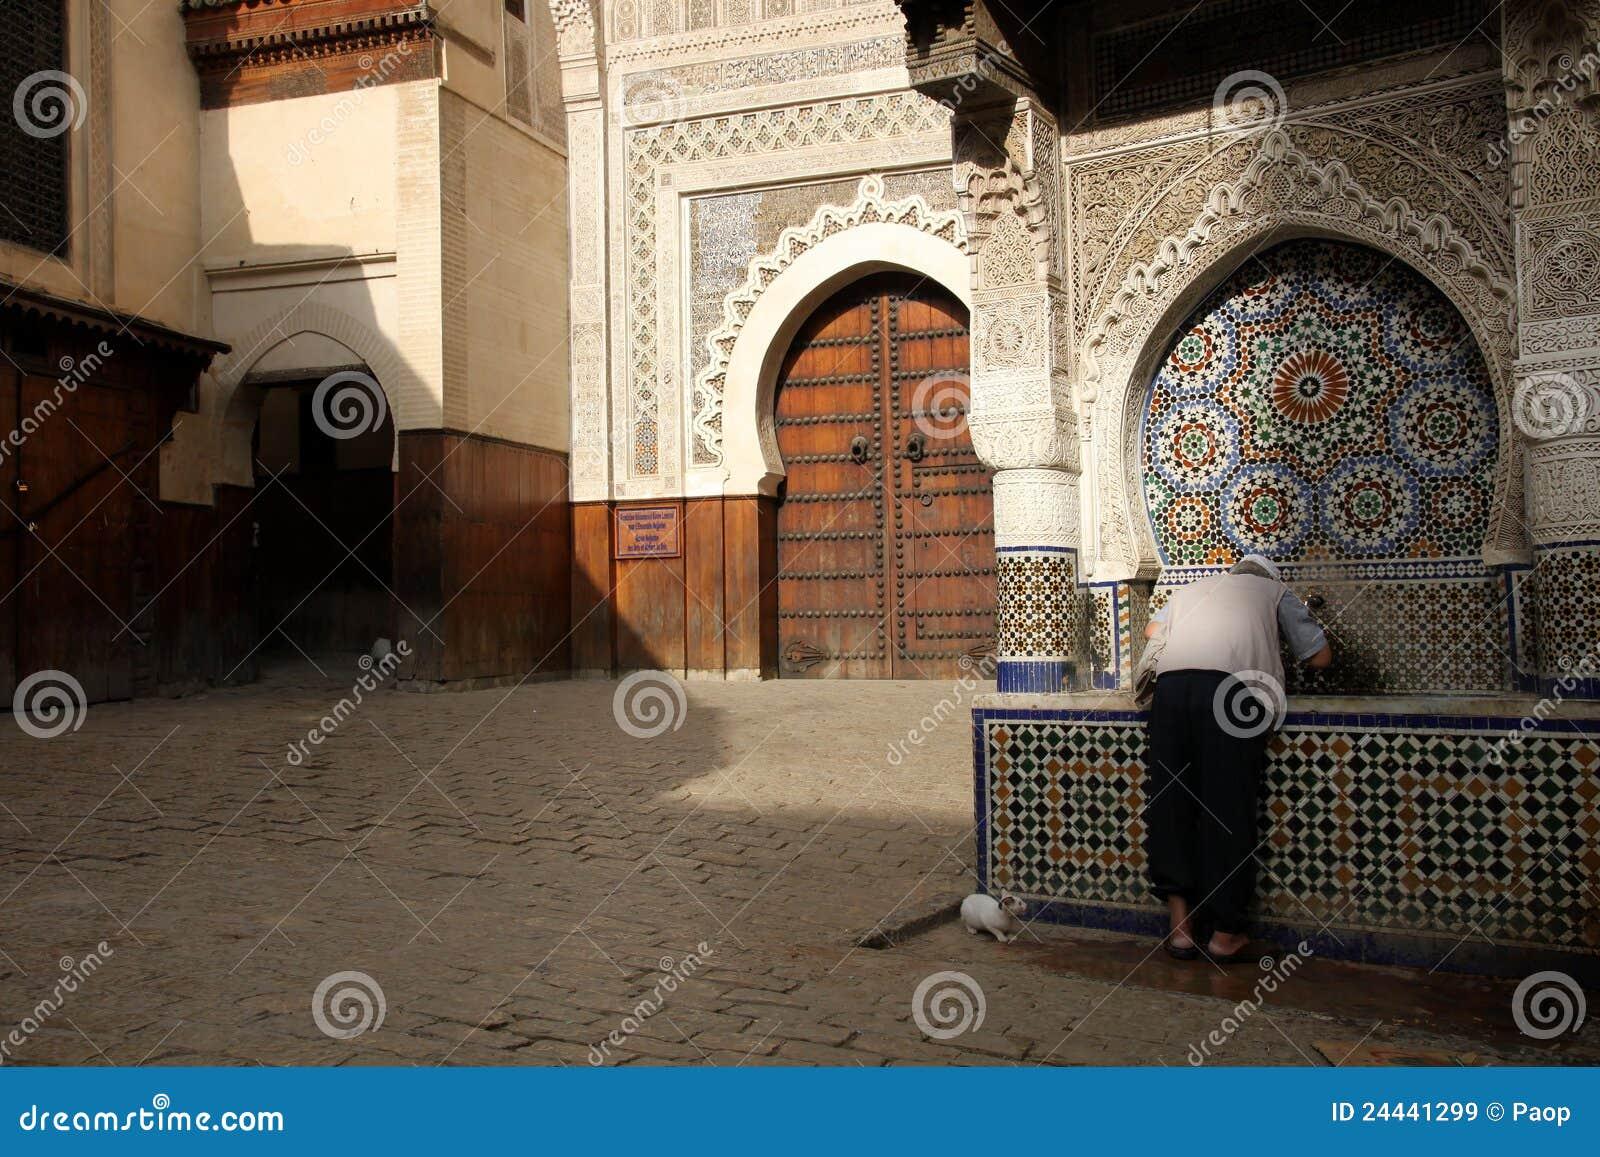 Eau potable dans le medina